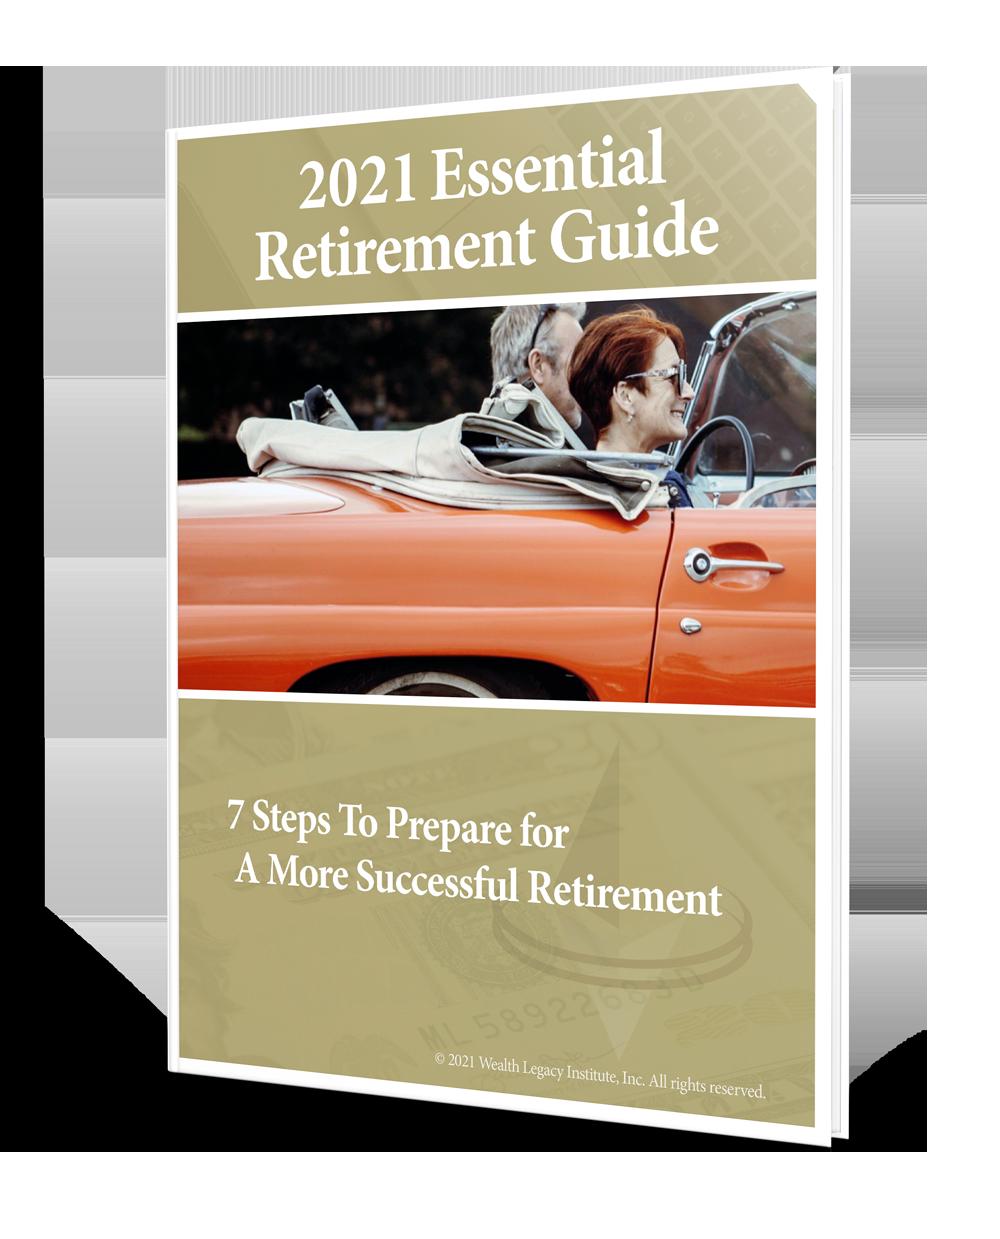 2021-Essential-Retirement-Guide-Book